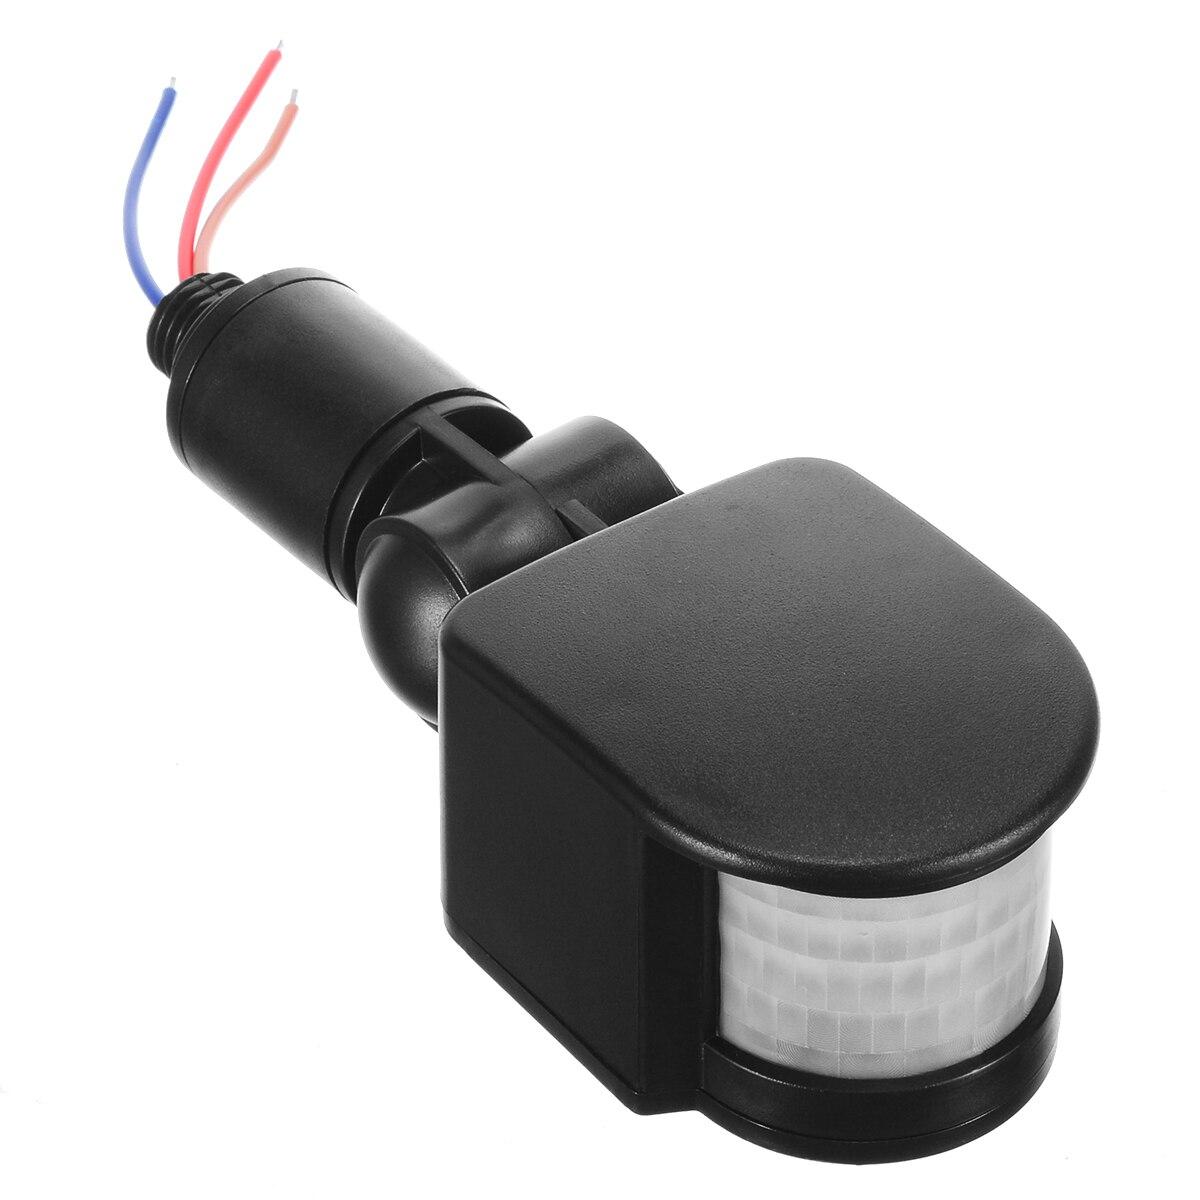 Mayitr Outdoor LED Infrarot PIR Motion Sensor Detektor 110-220 V Wand Licht 140 Grad Motion Sensor Licht Schalter